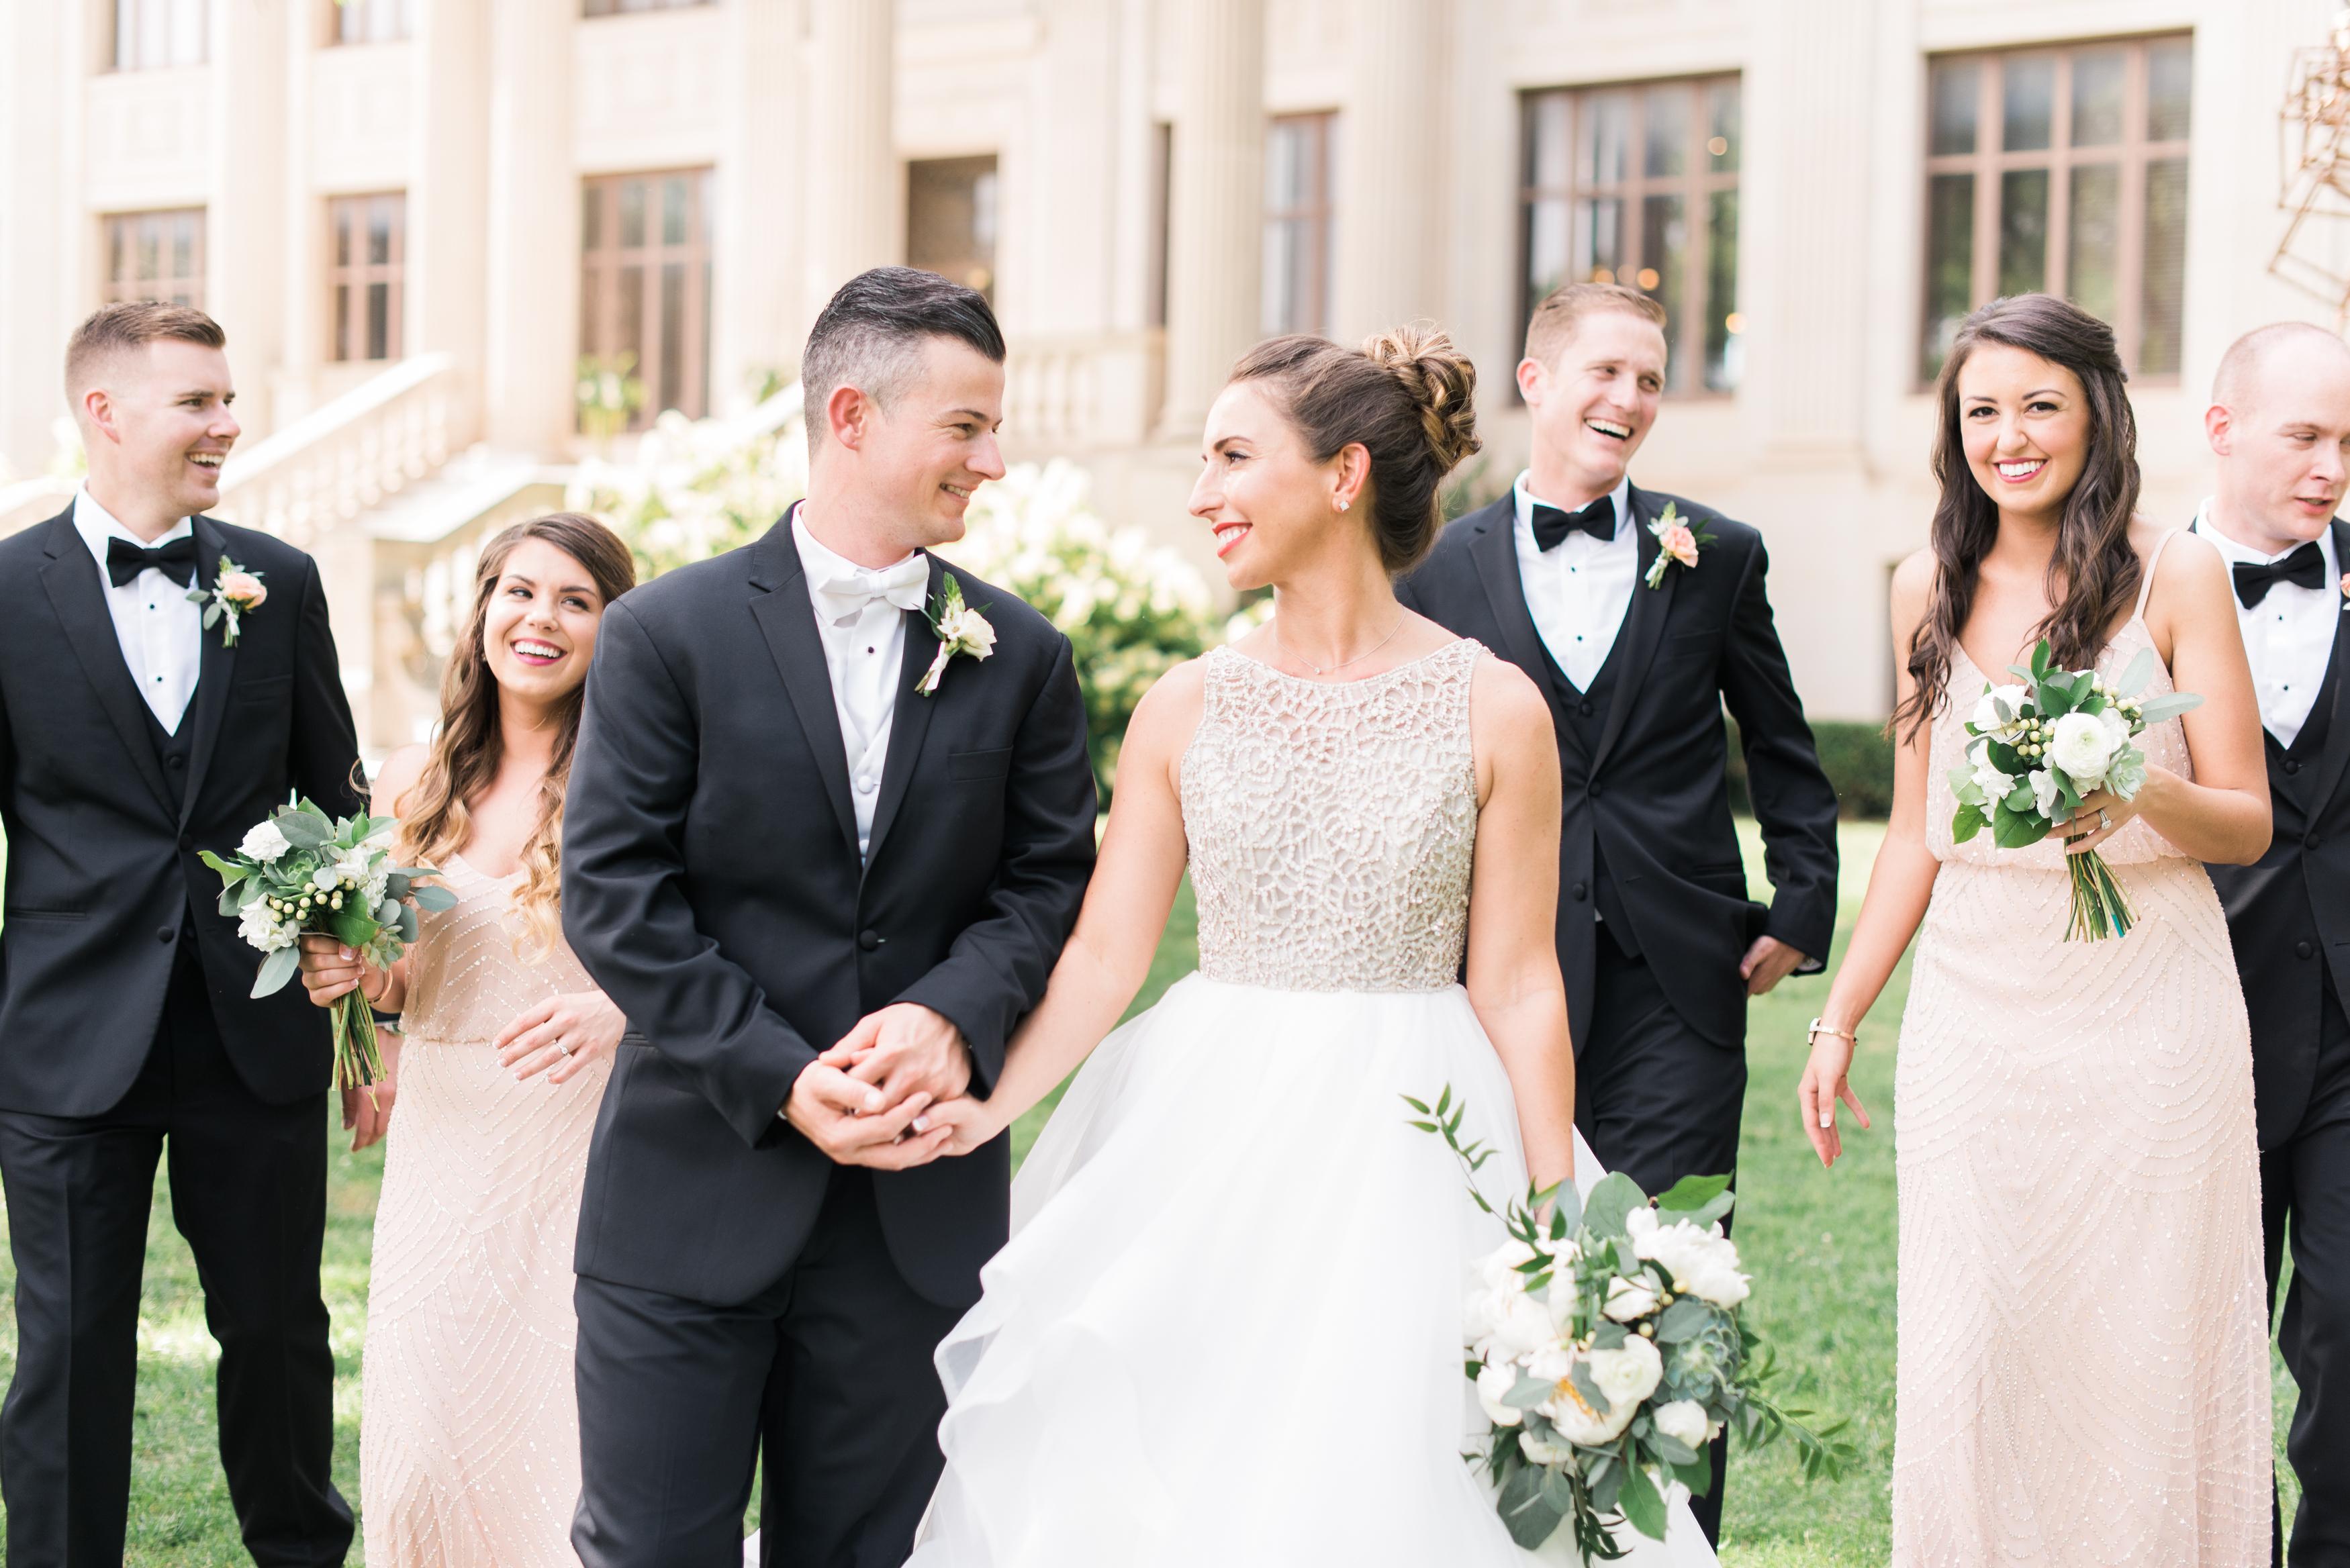 Kristina Gaines Photography - Oklahoma Wedding Photography